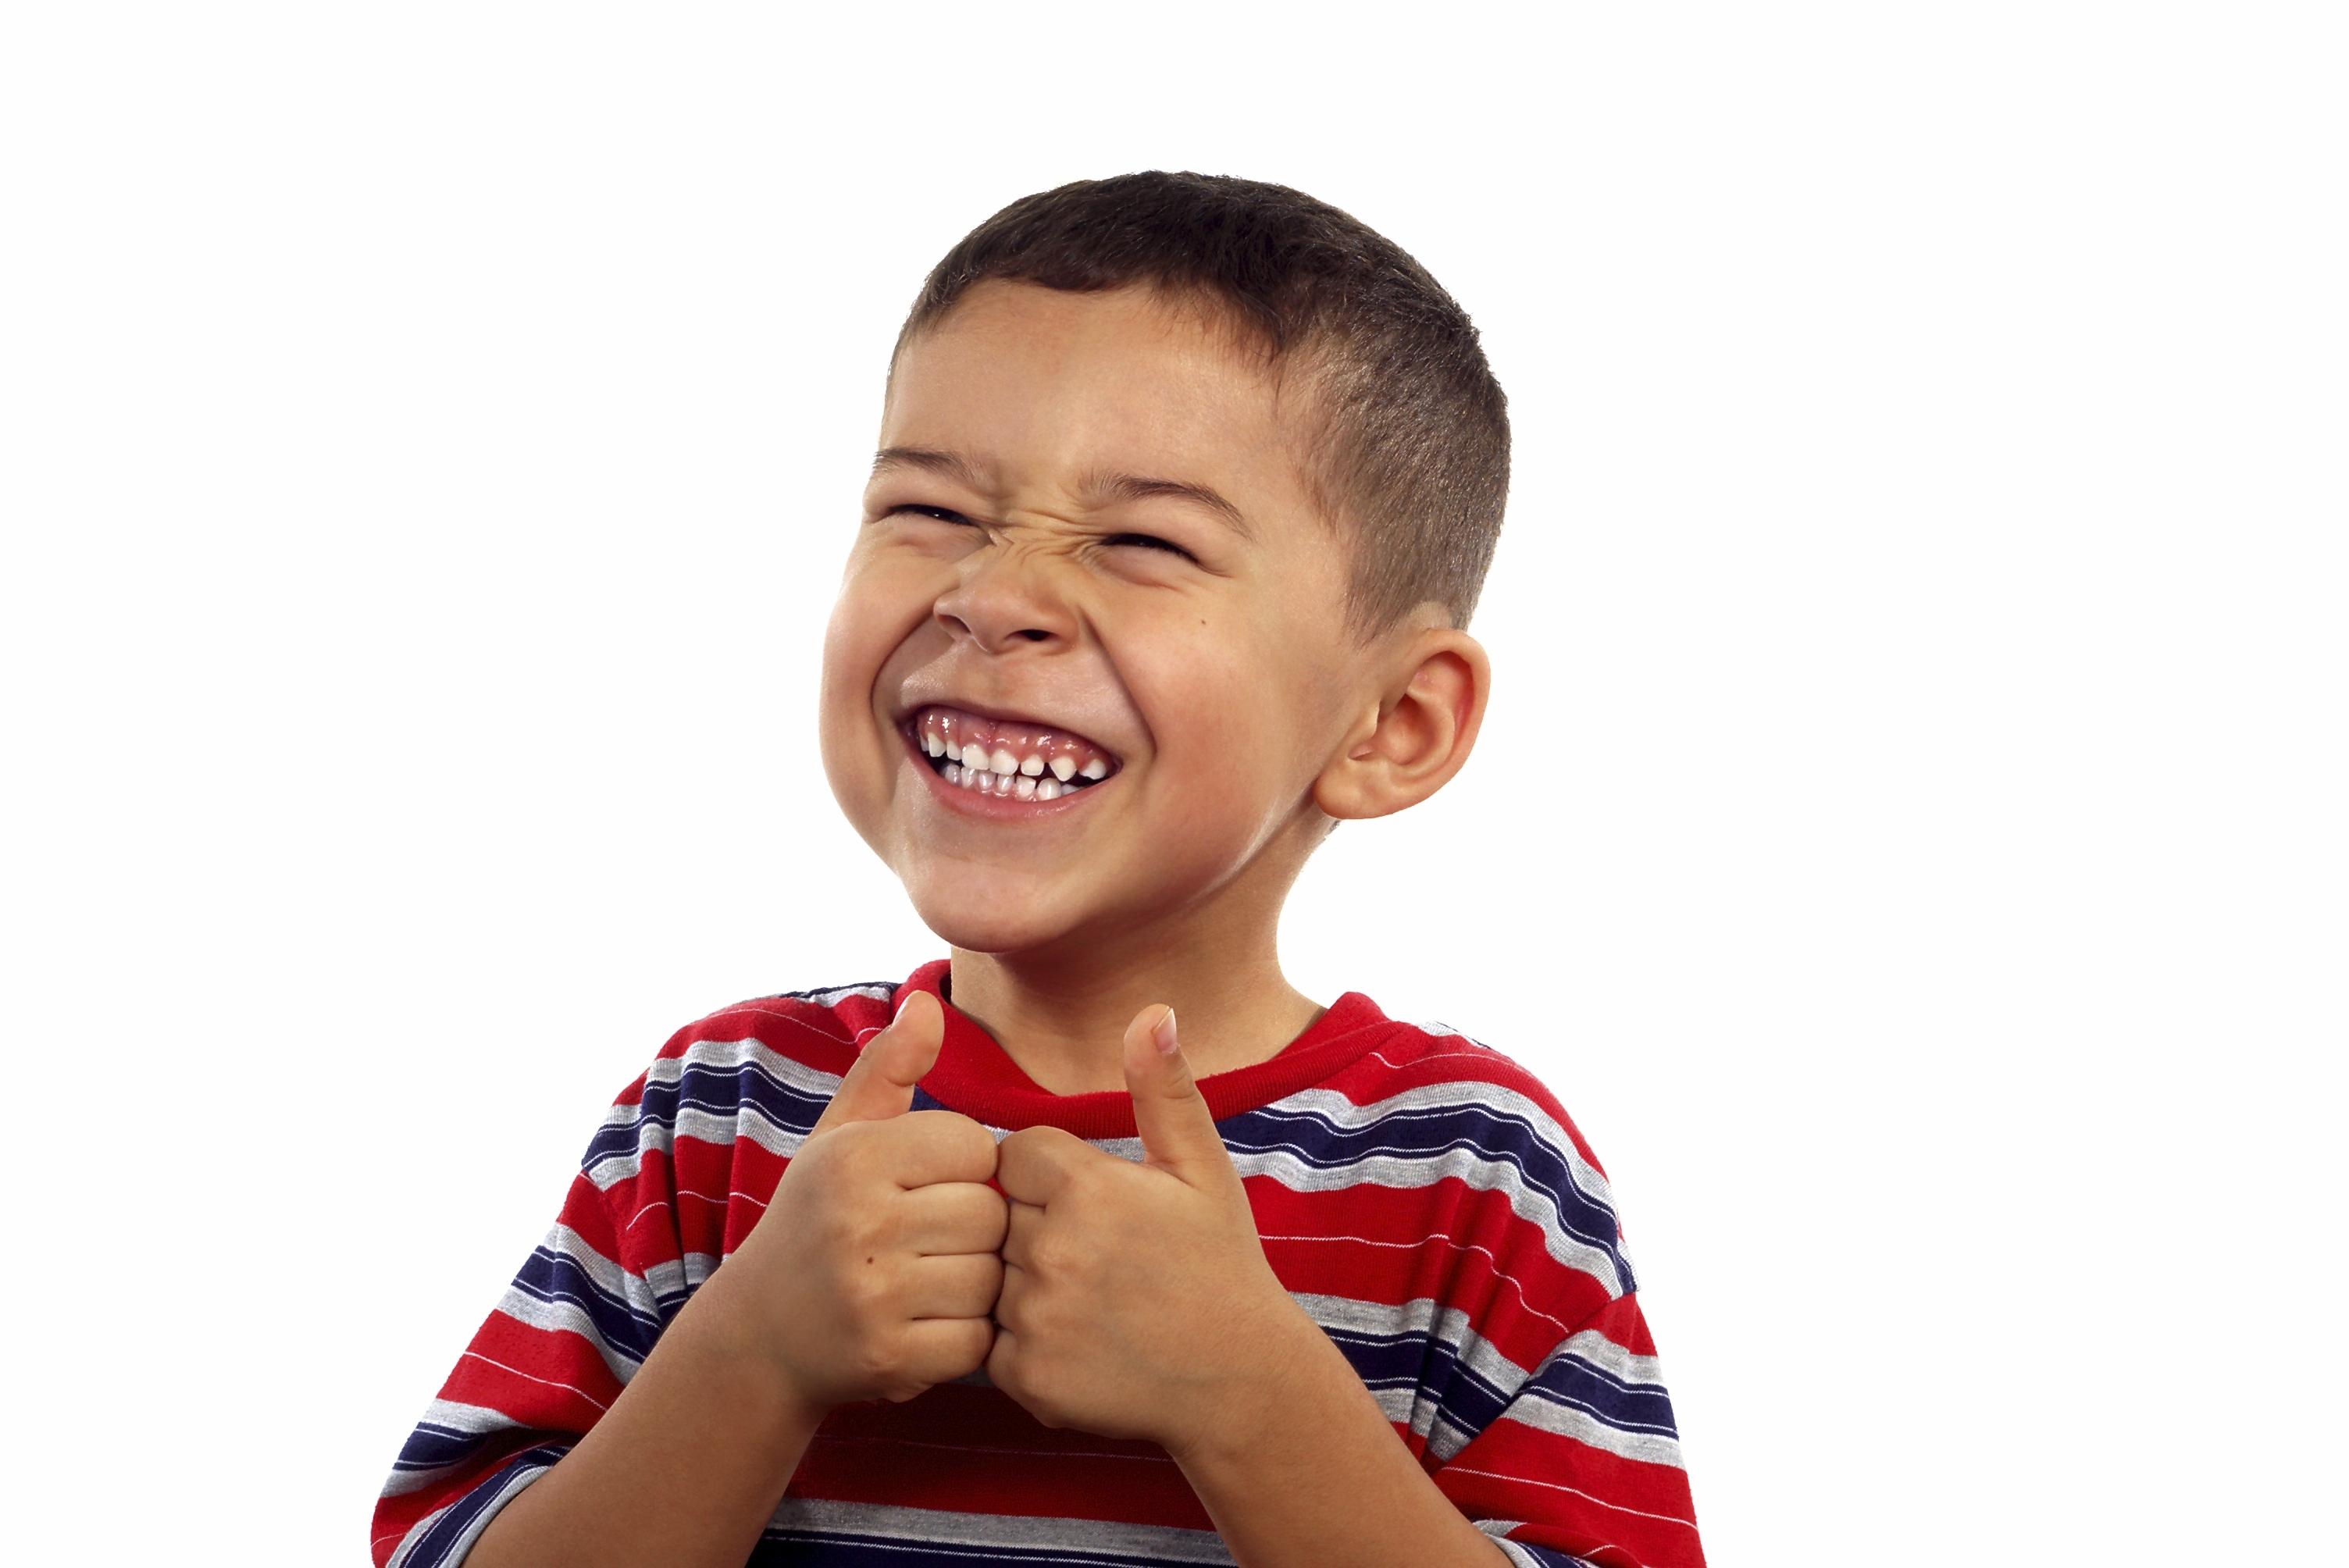 「thumbs up boy」の画像検索結果